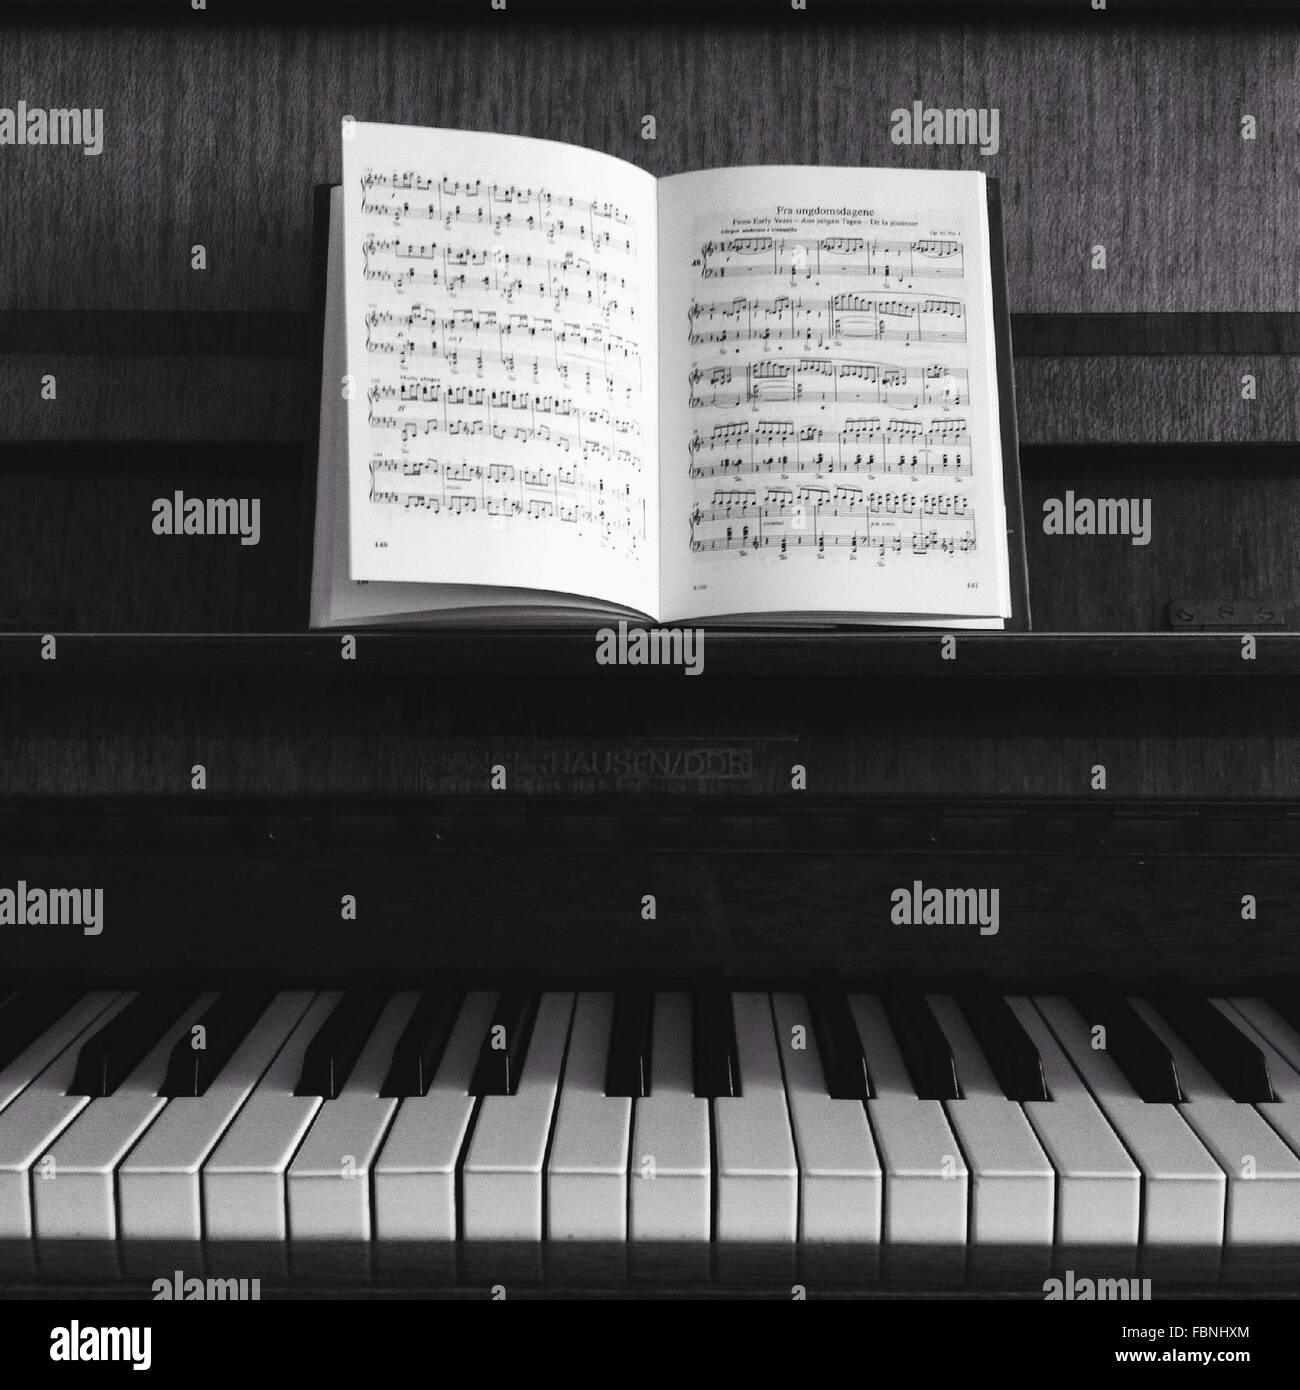 Gehalten am Klavier Noten Stockbild